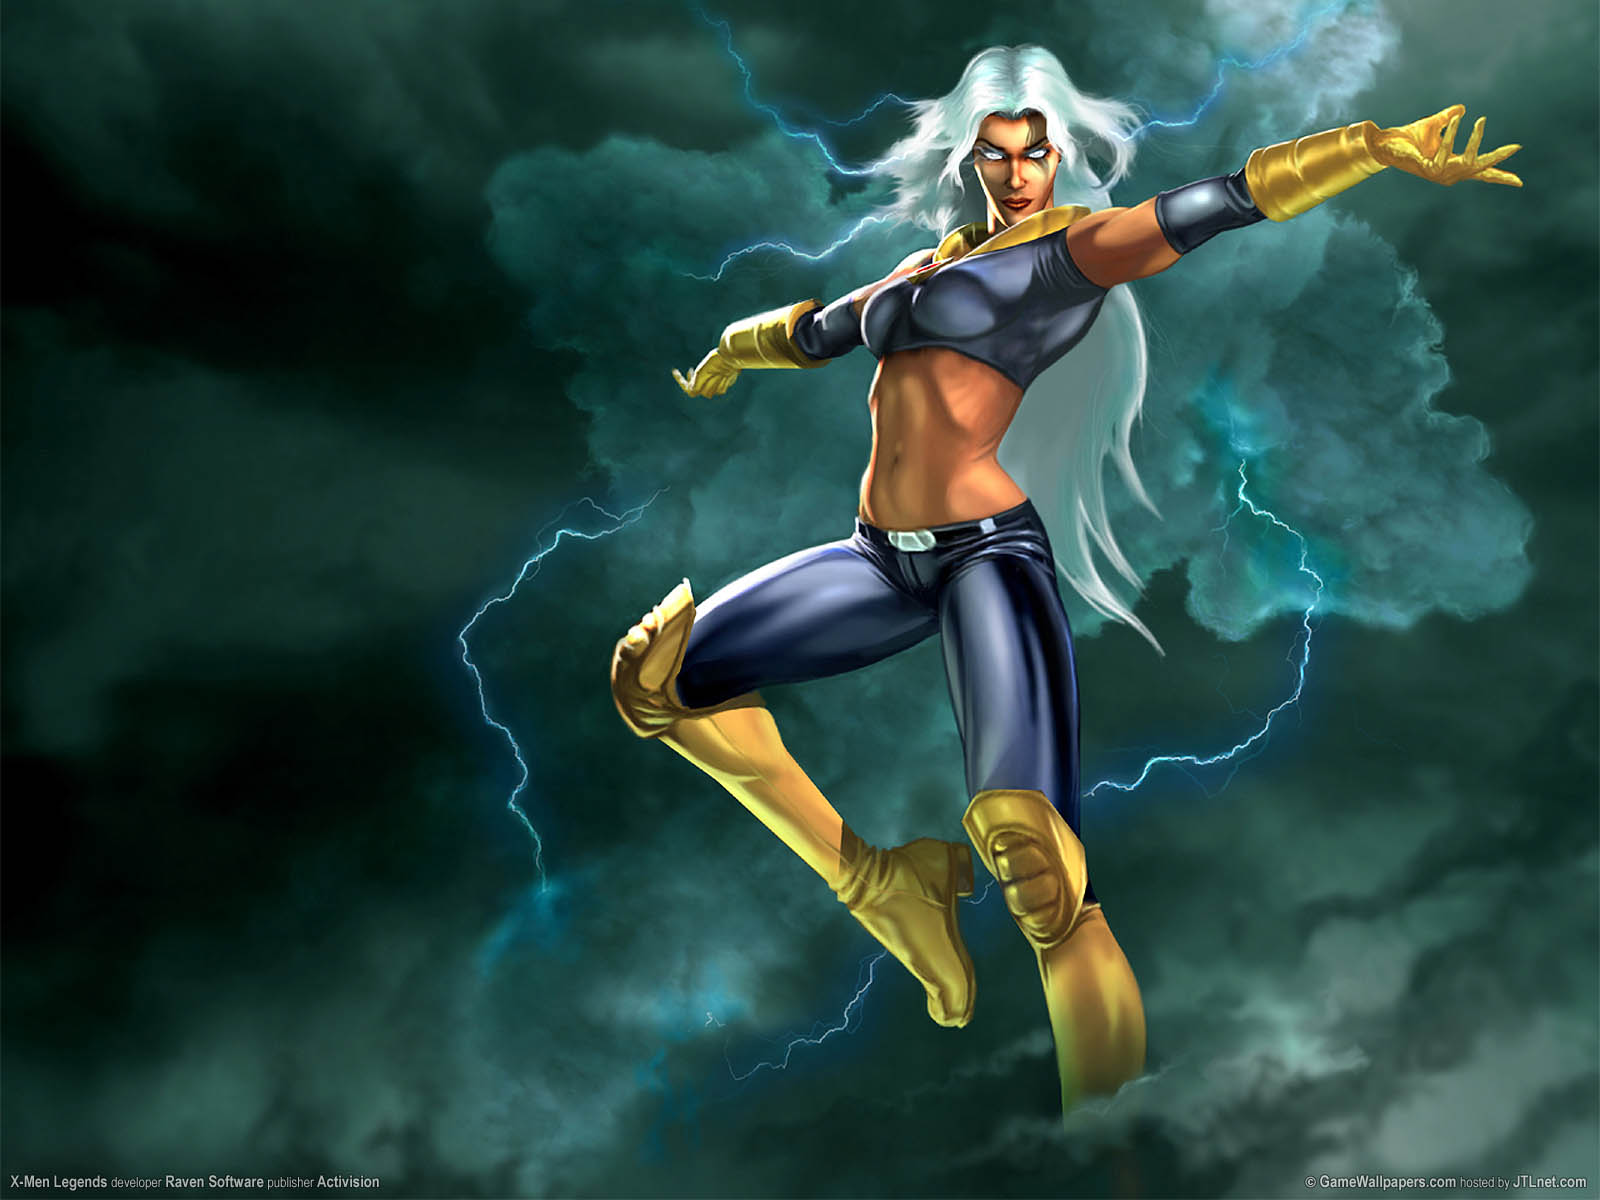 X-Men Legends Hintergrundbild 01 1600x1200